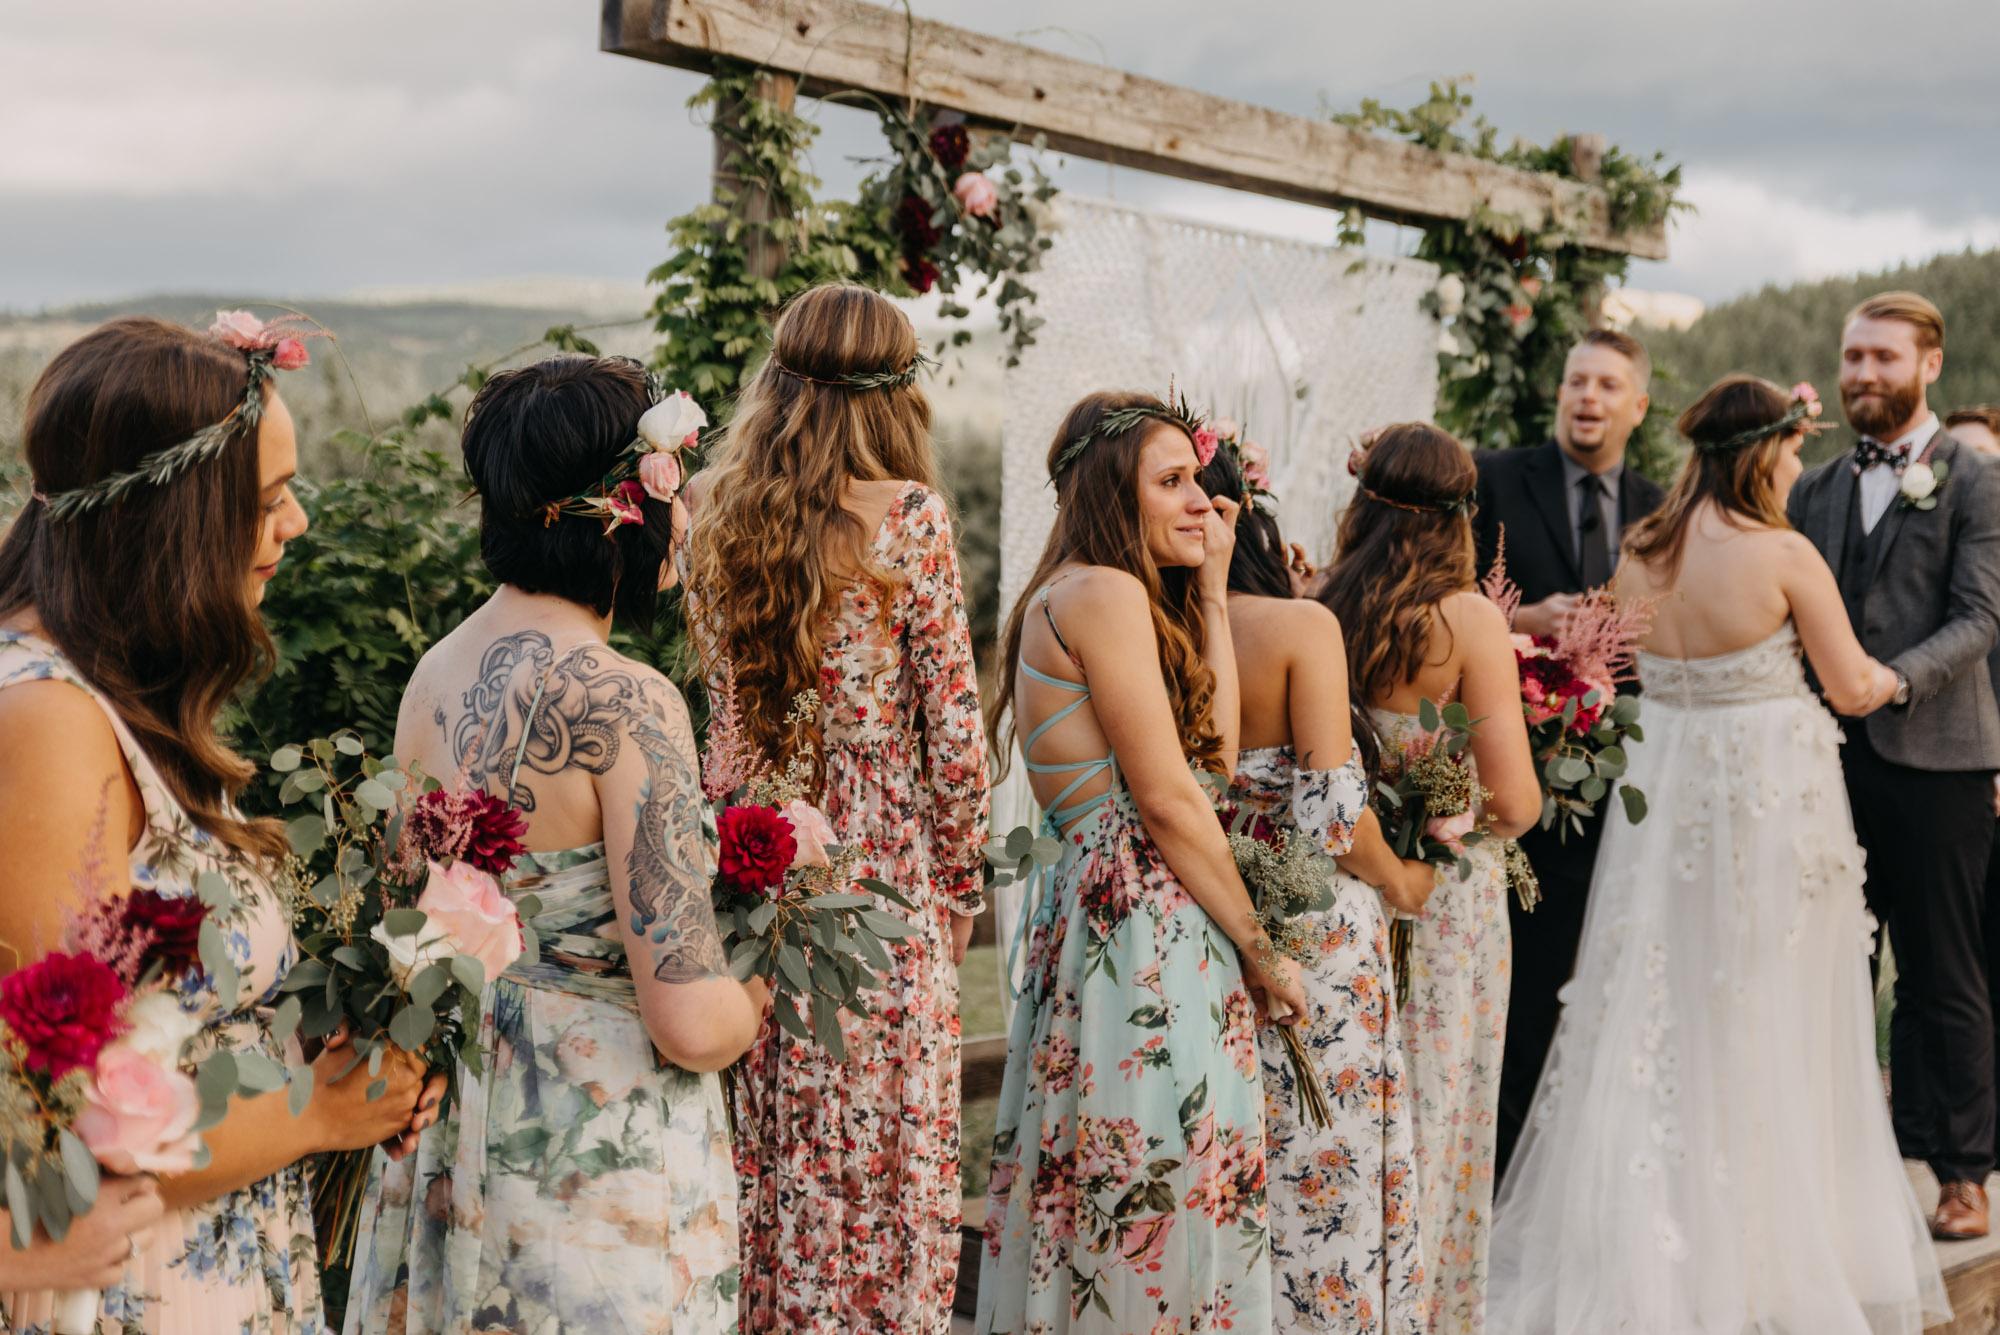 Outdoor-Summer-Ceremony-Washington-Wedding-Rainbow-5406.jpg